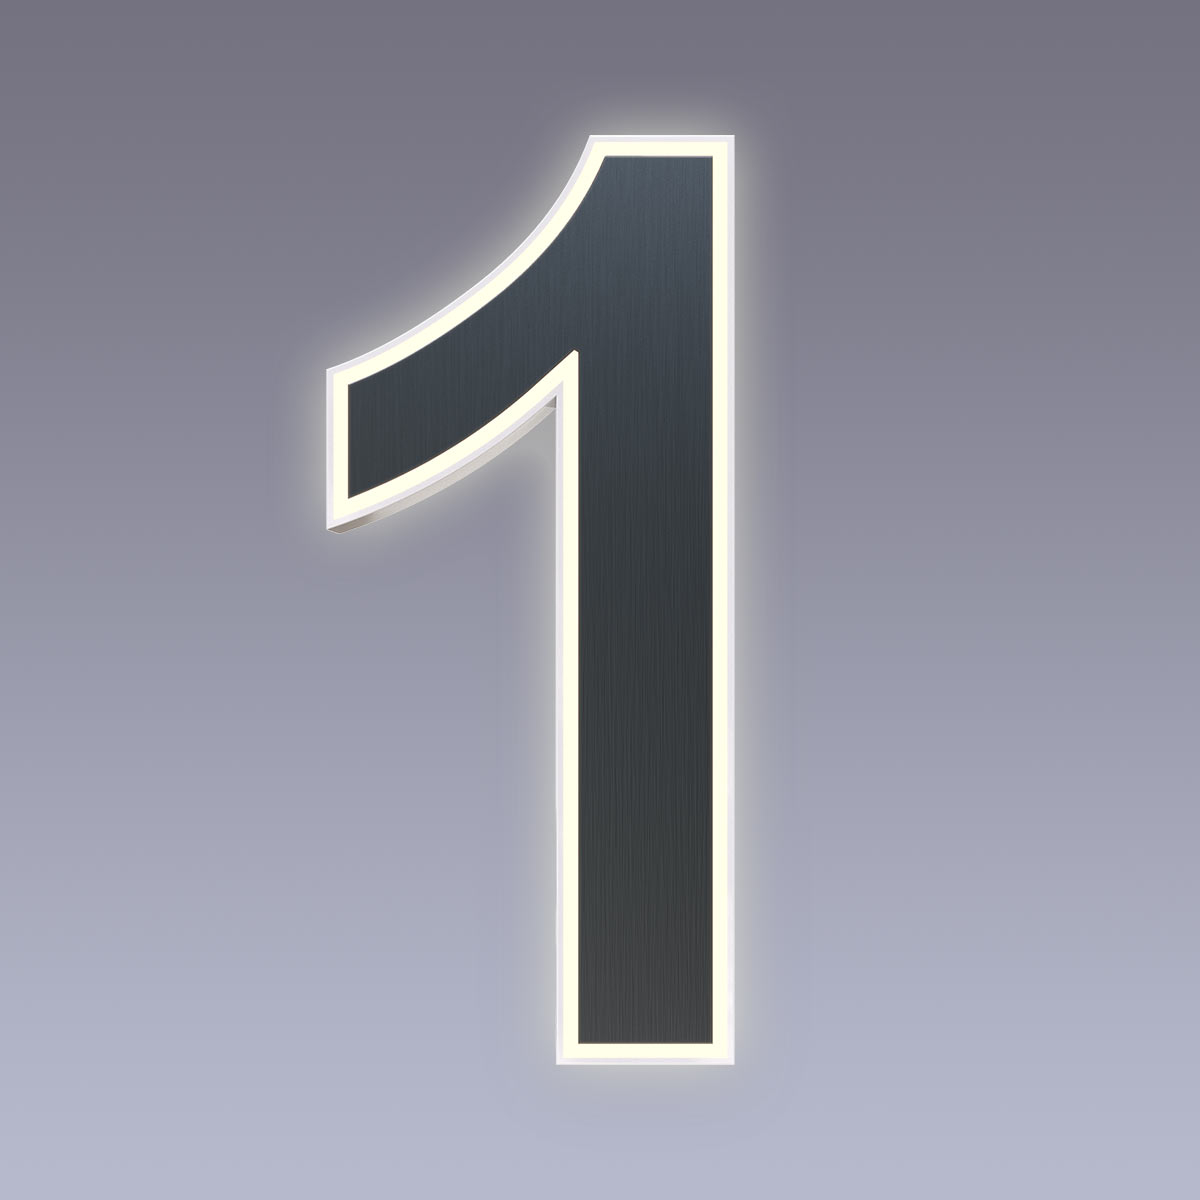 Cover für 15cm Hausnummer 1 Edelstahl anthrazit RAL7016 Arial selbstklebend